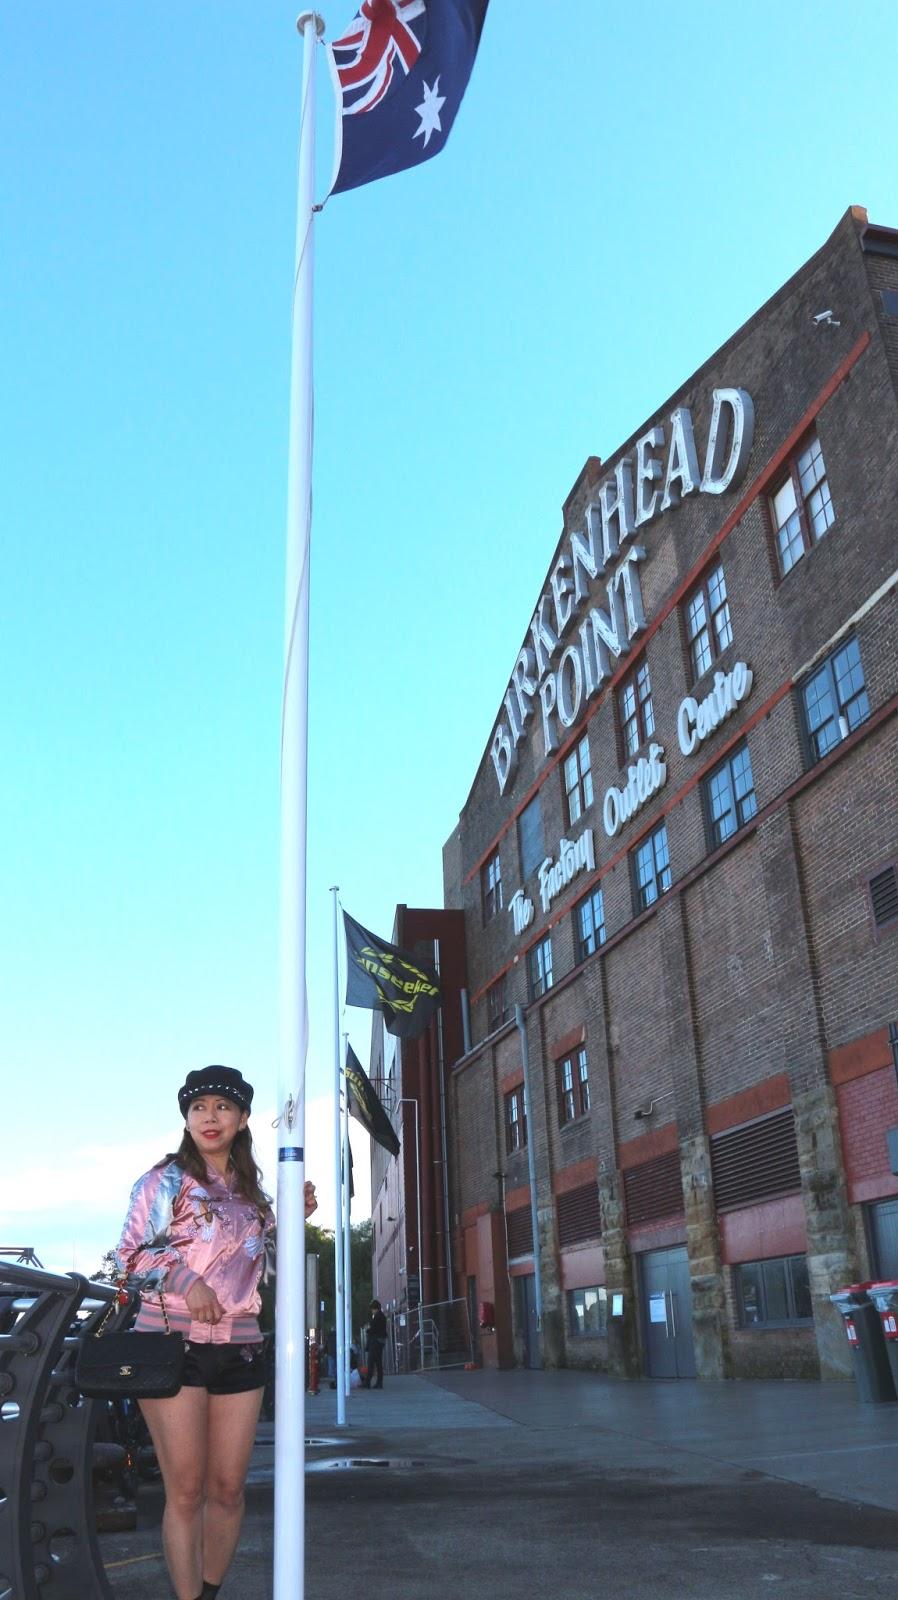 Birkenhead Point factory outlet